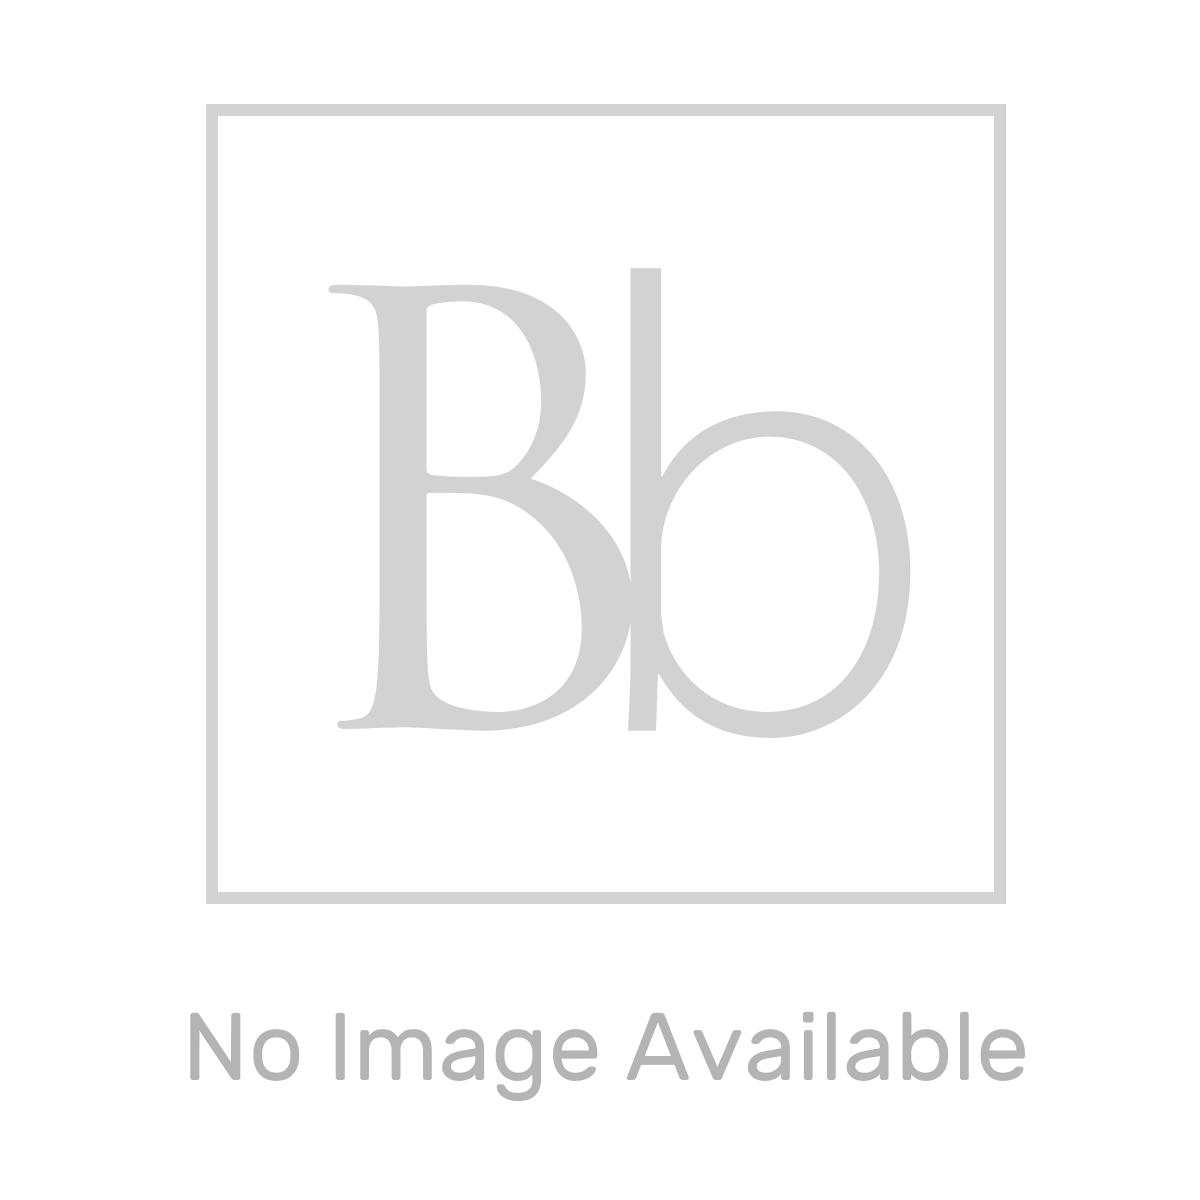 RAK 600 Toilet and Sink Vanity Unit Set 450mm